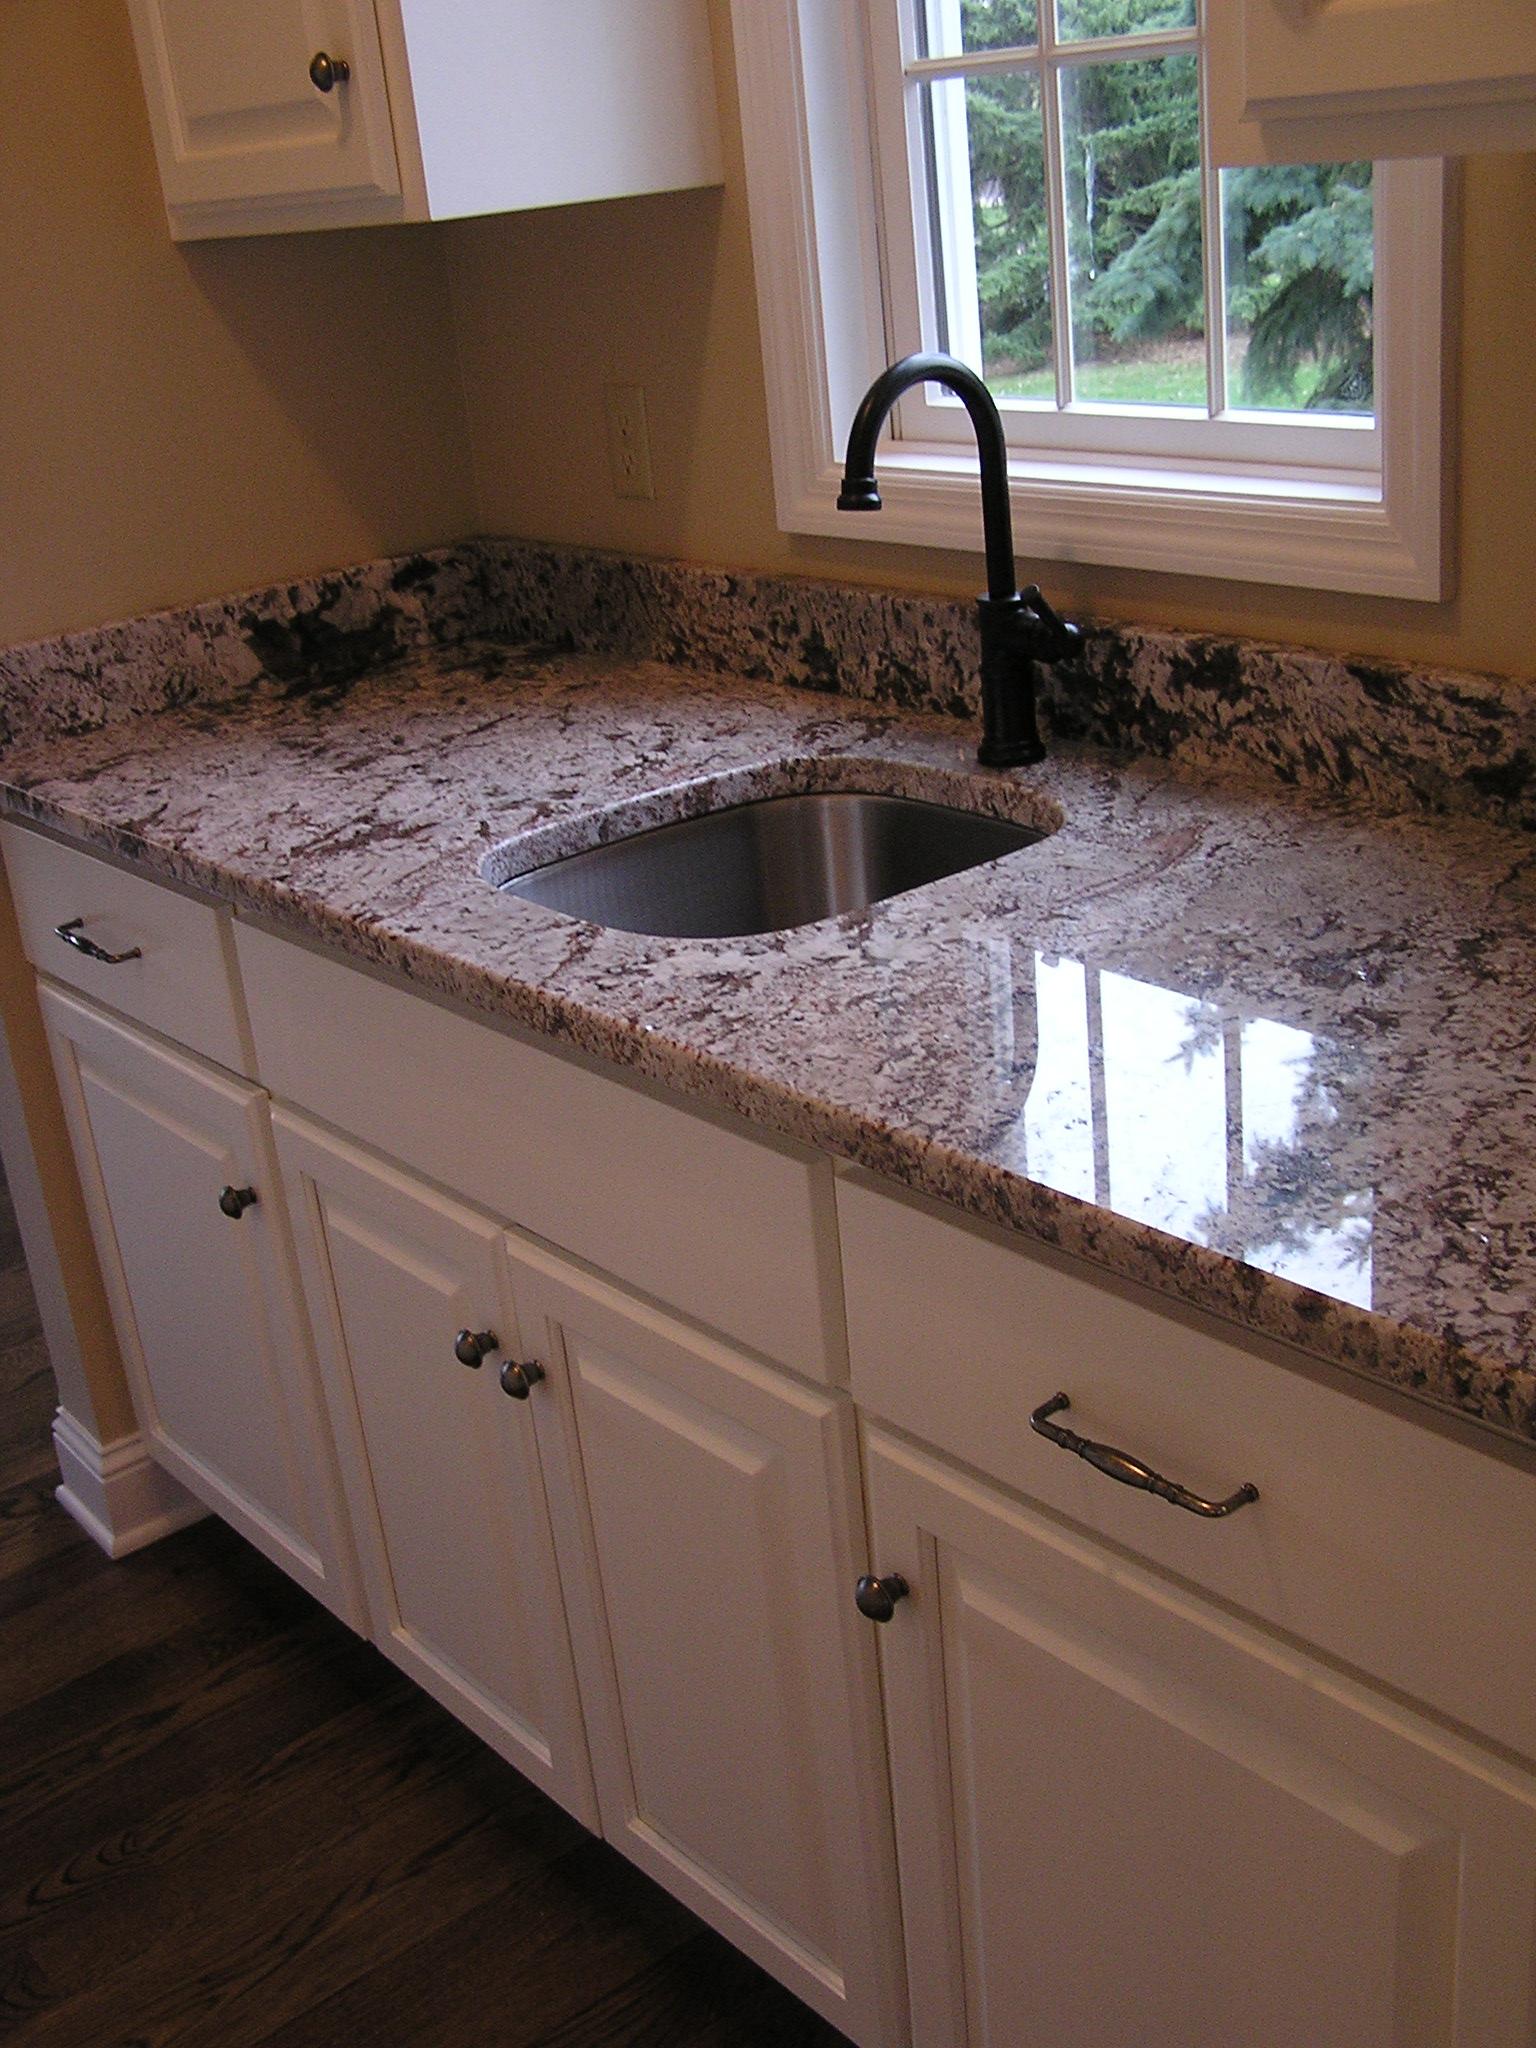 Twin Cities kitchen countertops